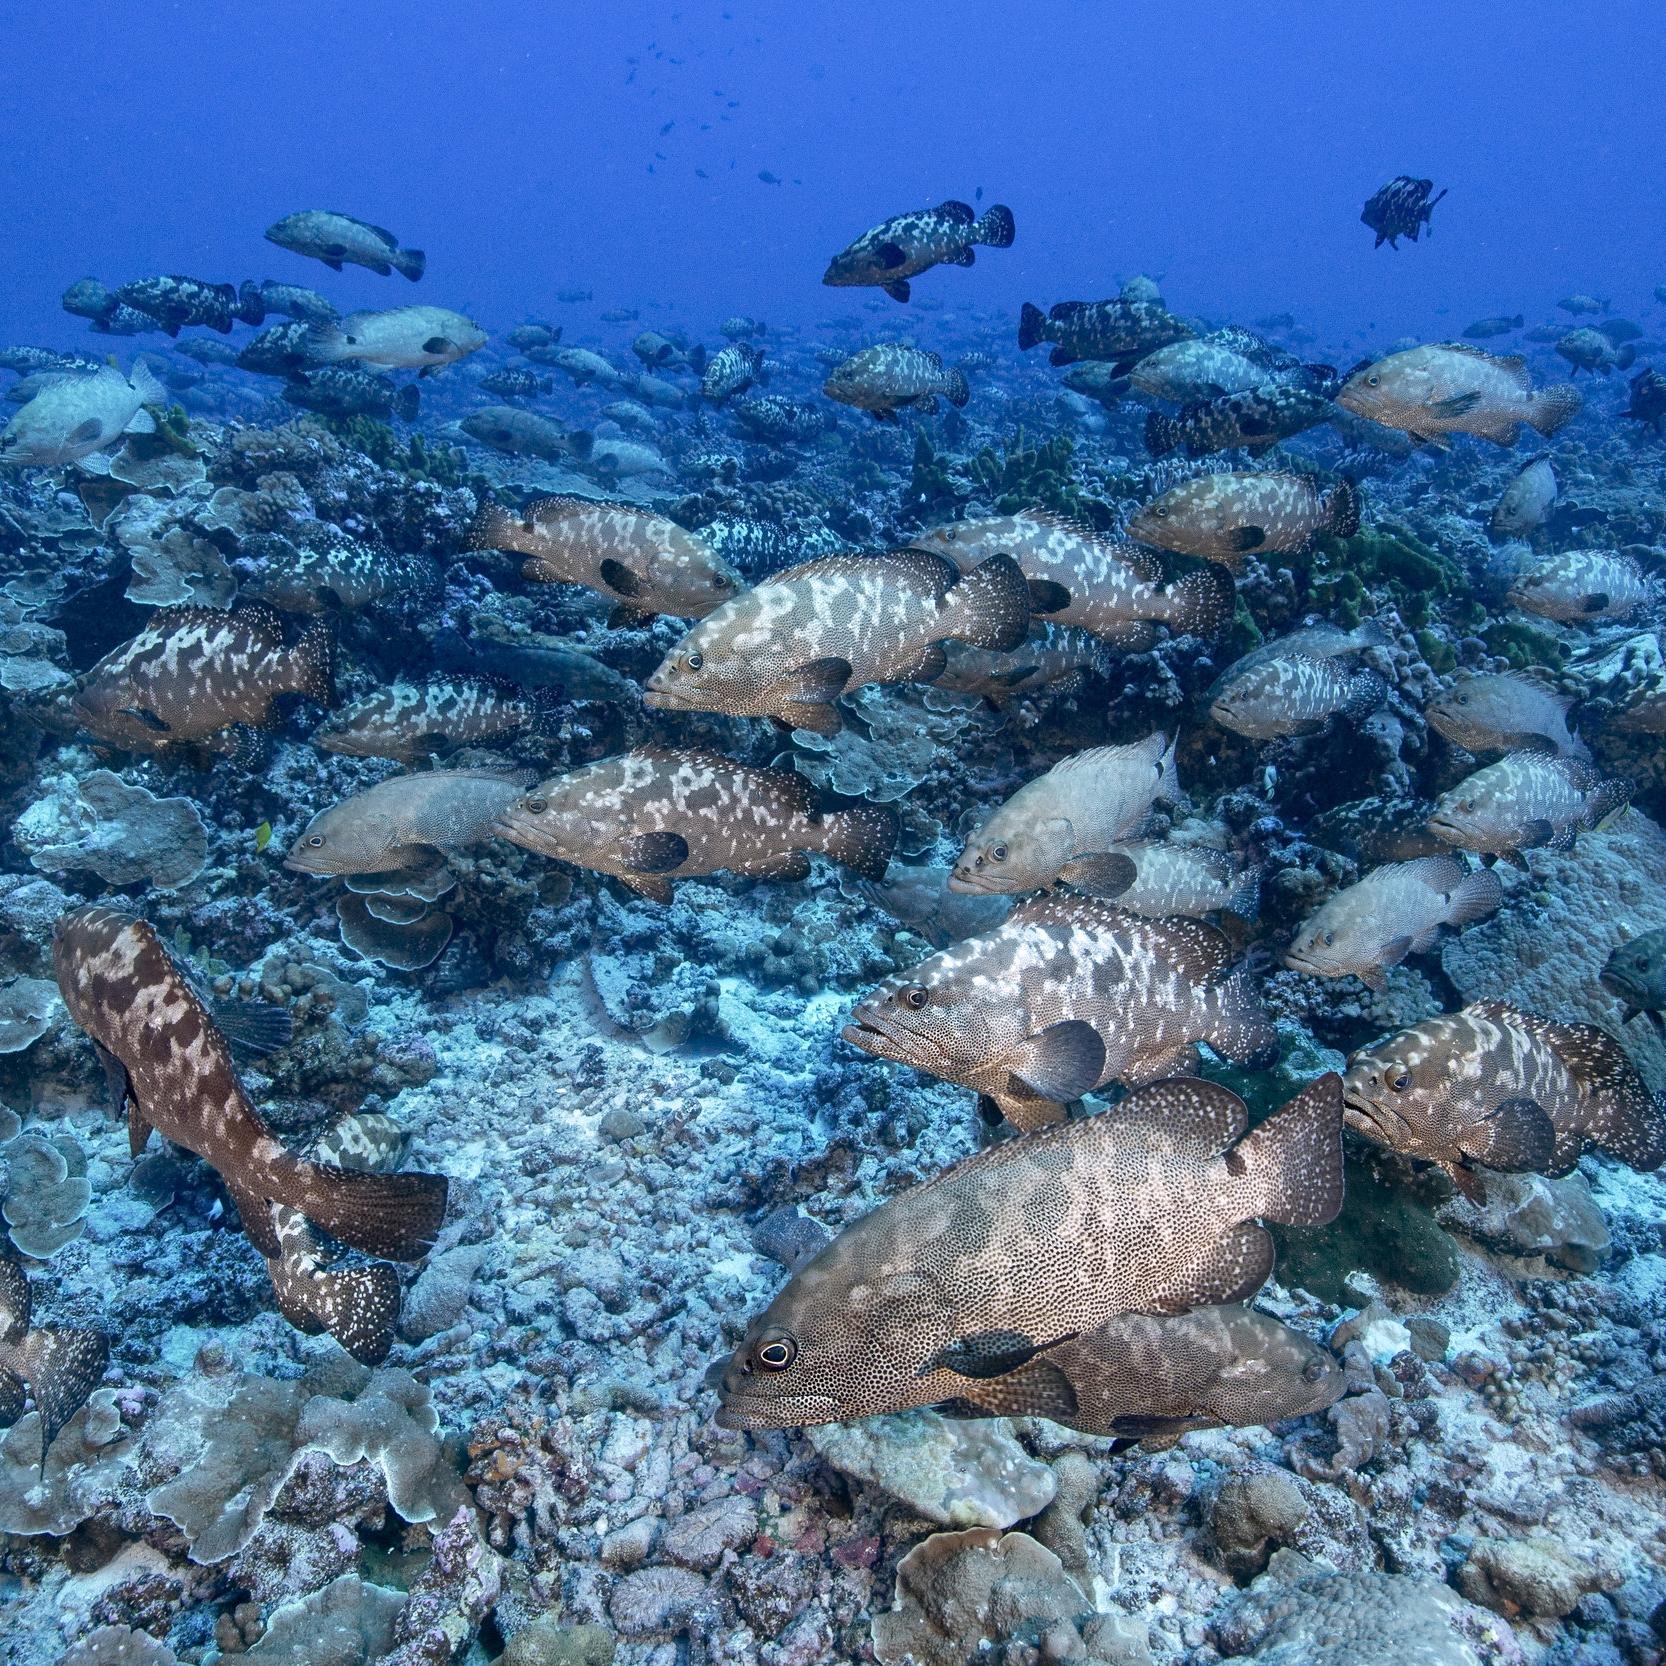 The grouper spawning aggregation of Fakarava, Tahiti.